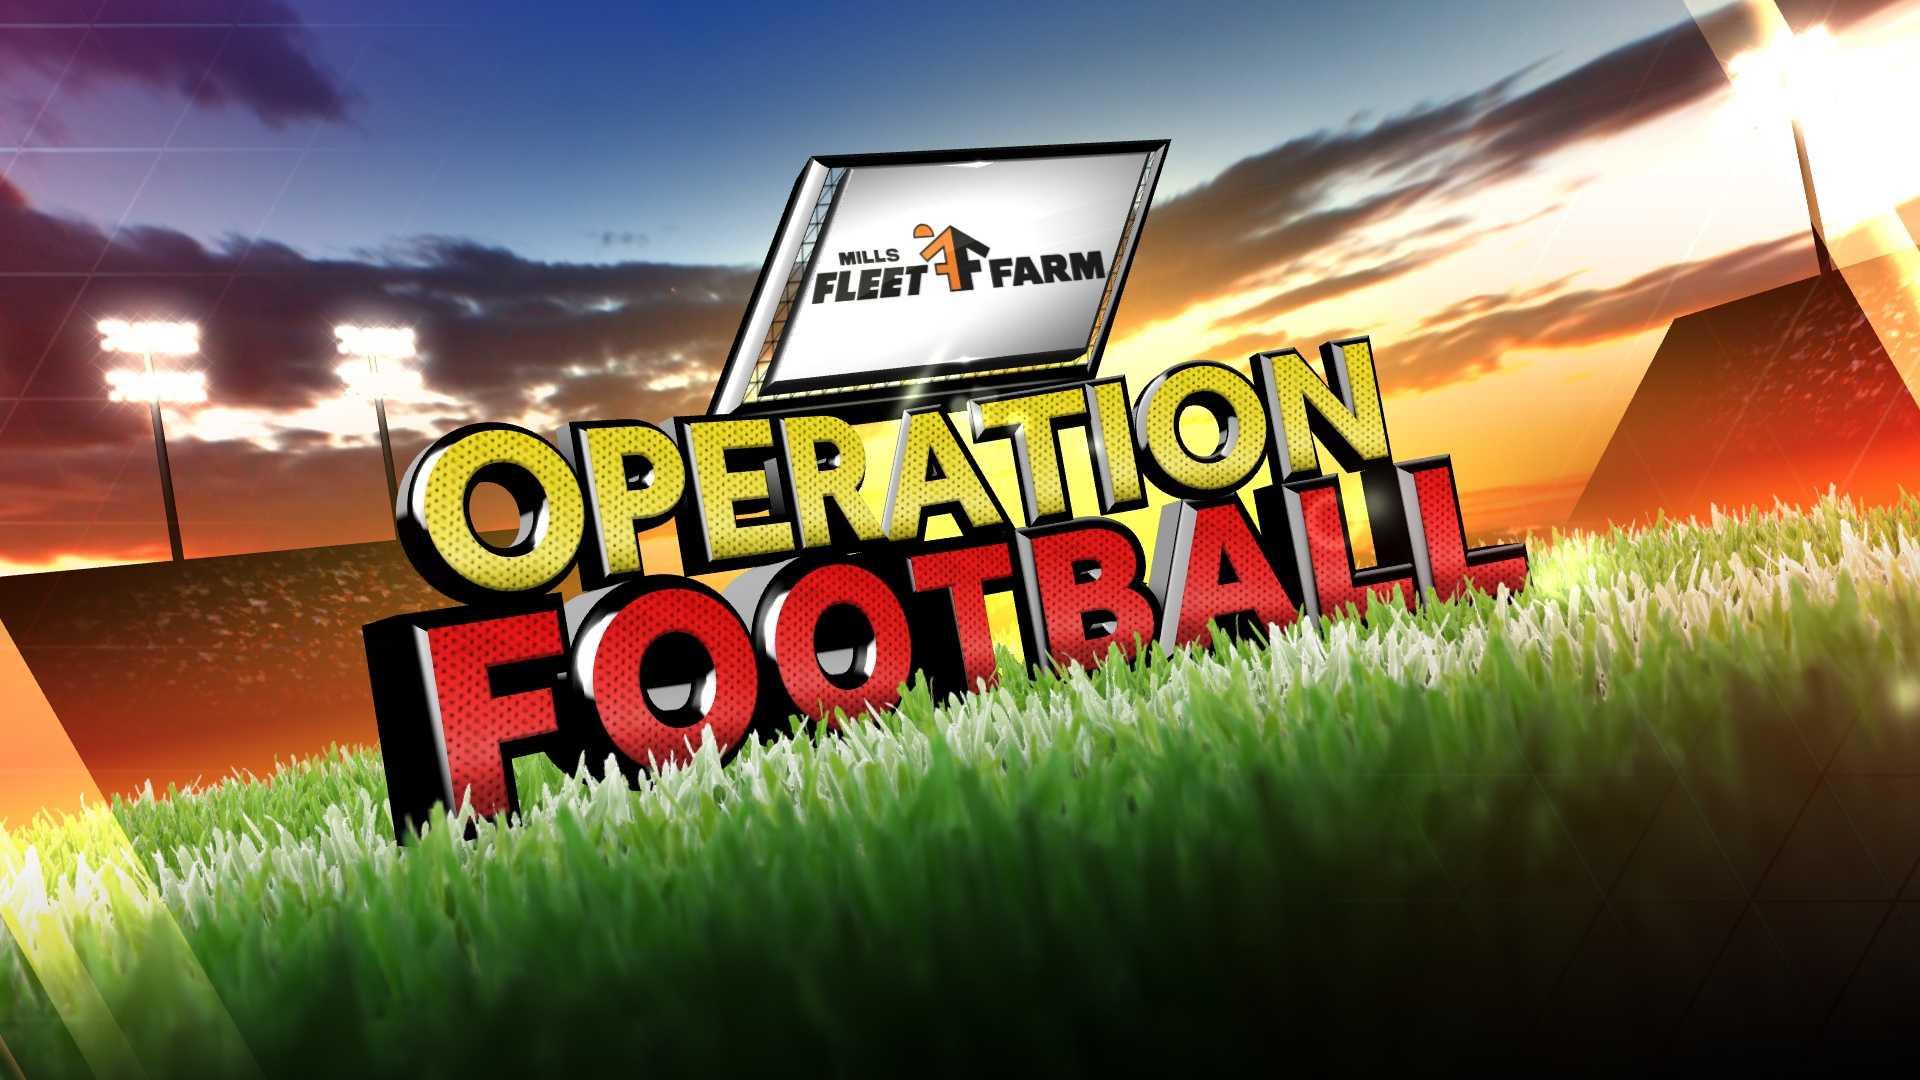 Operation Football Fleet Farm